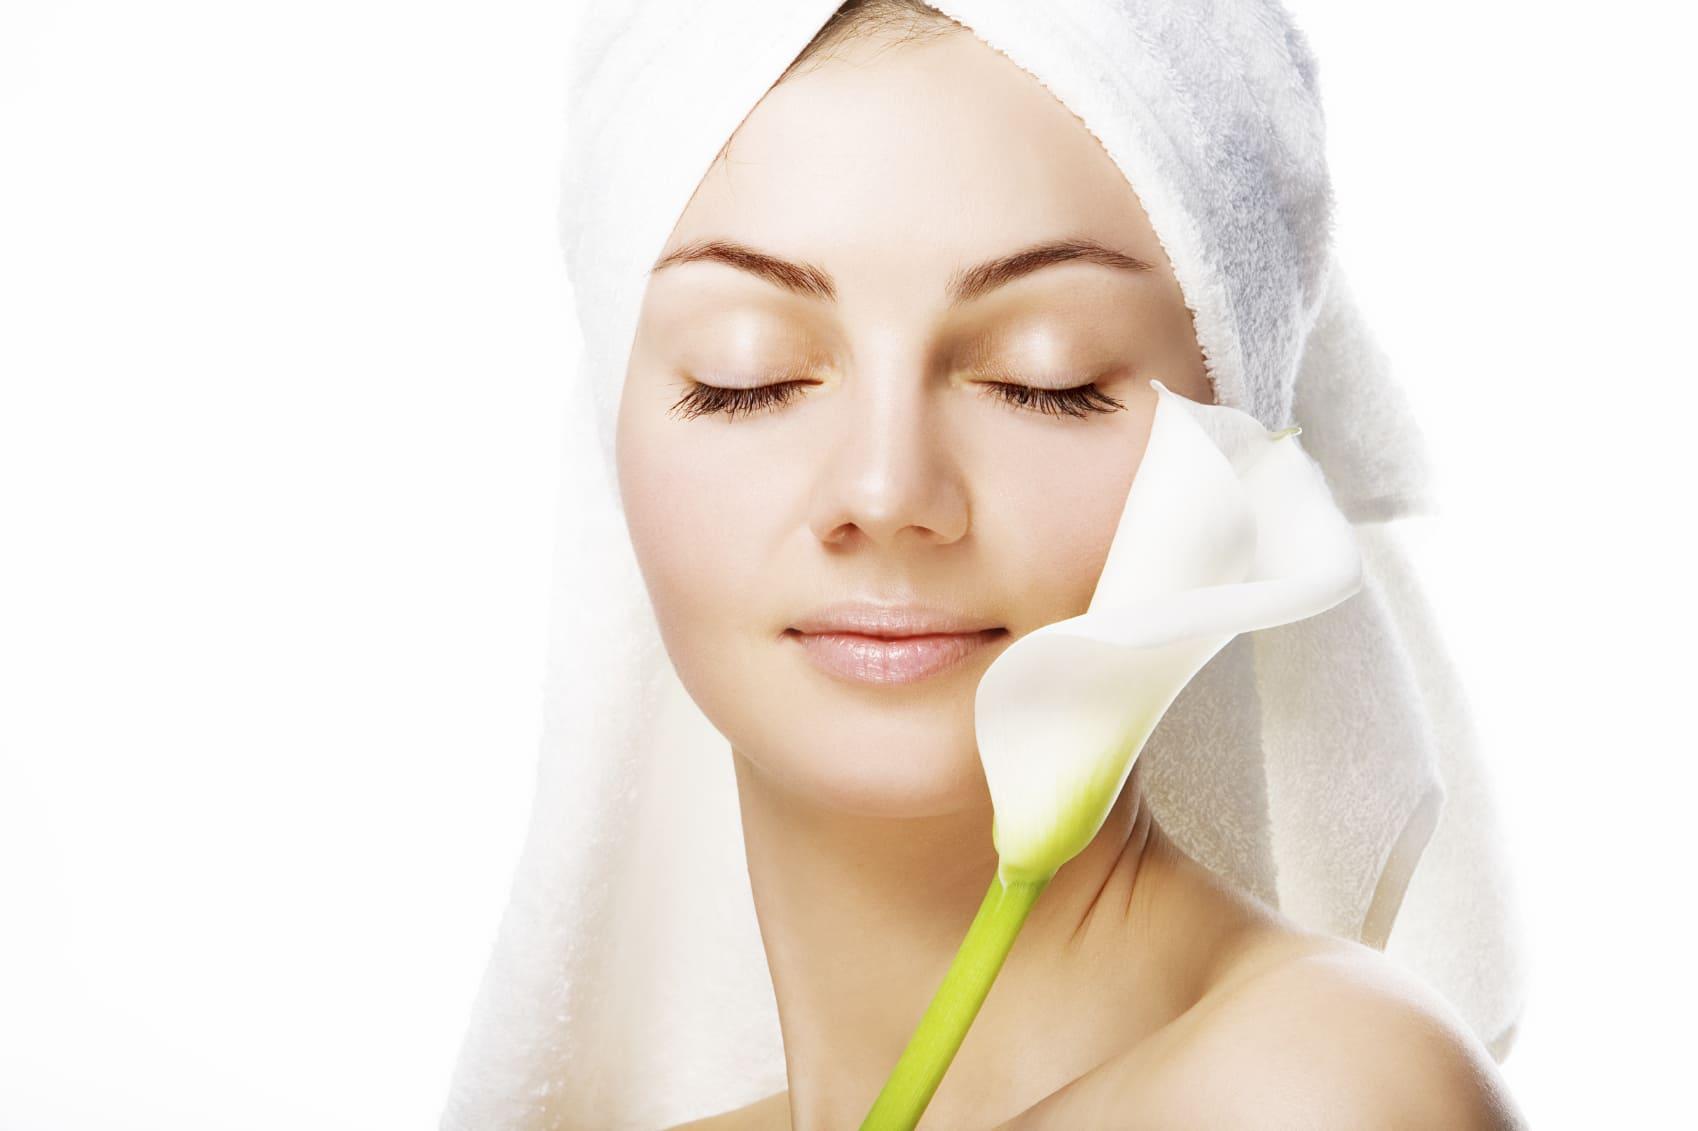 pele bonita - BioLumem Firm: O Laser em Creme